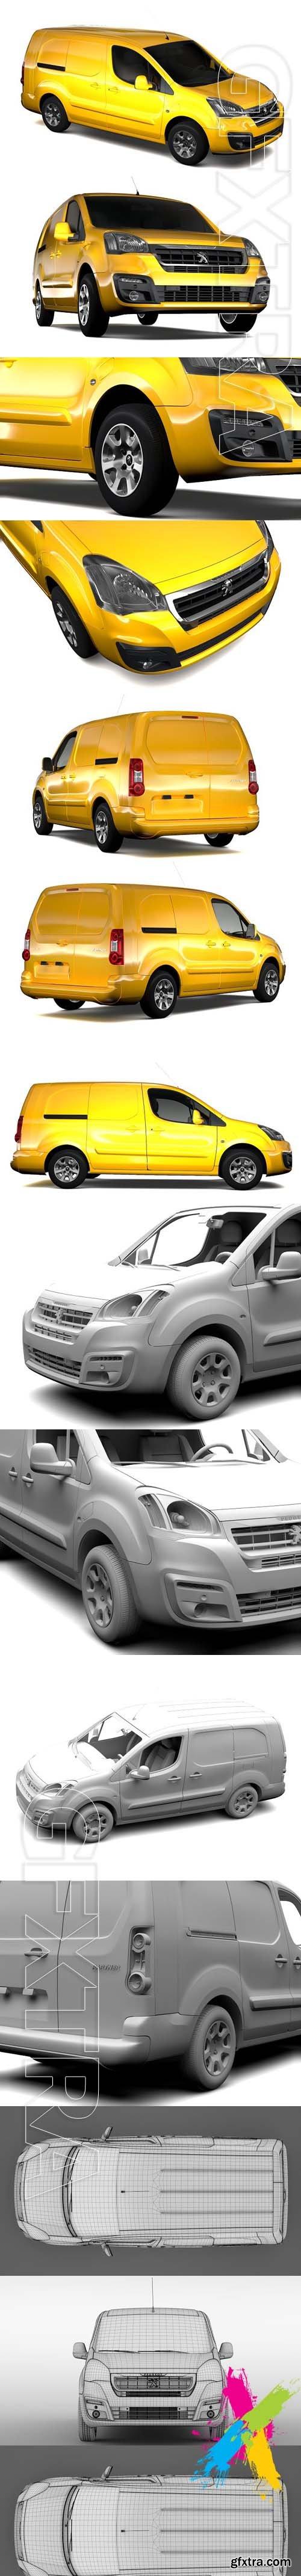 CreativeMarket - Peugeot Partner Van L2 Electric 2017 1844468